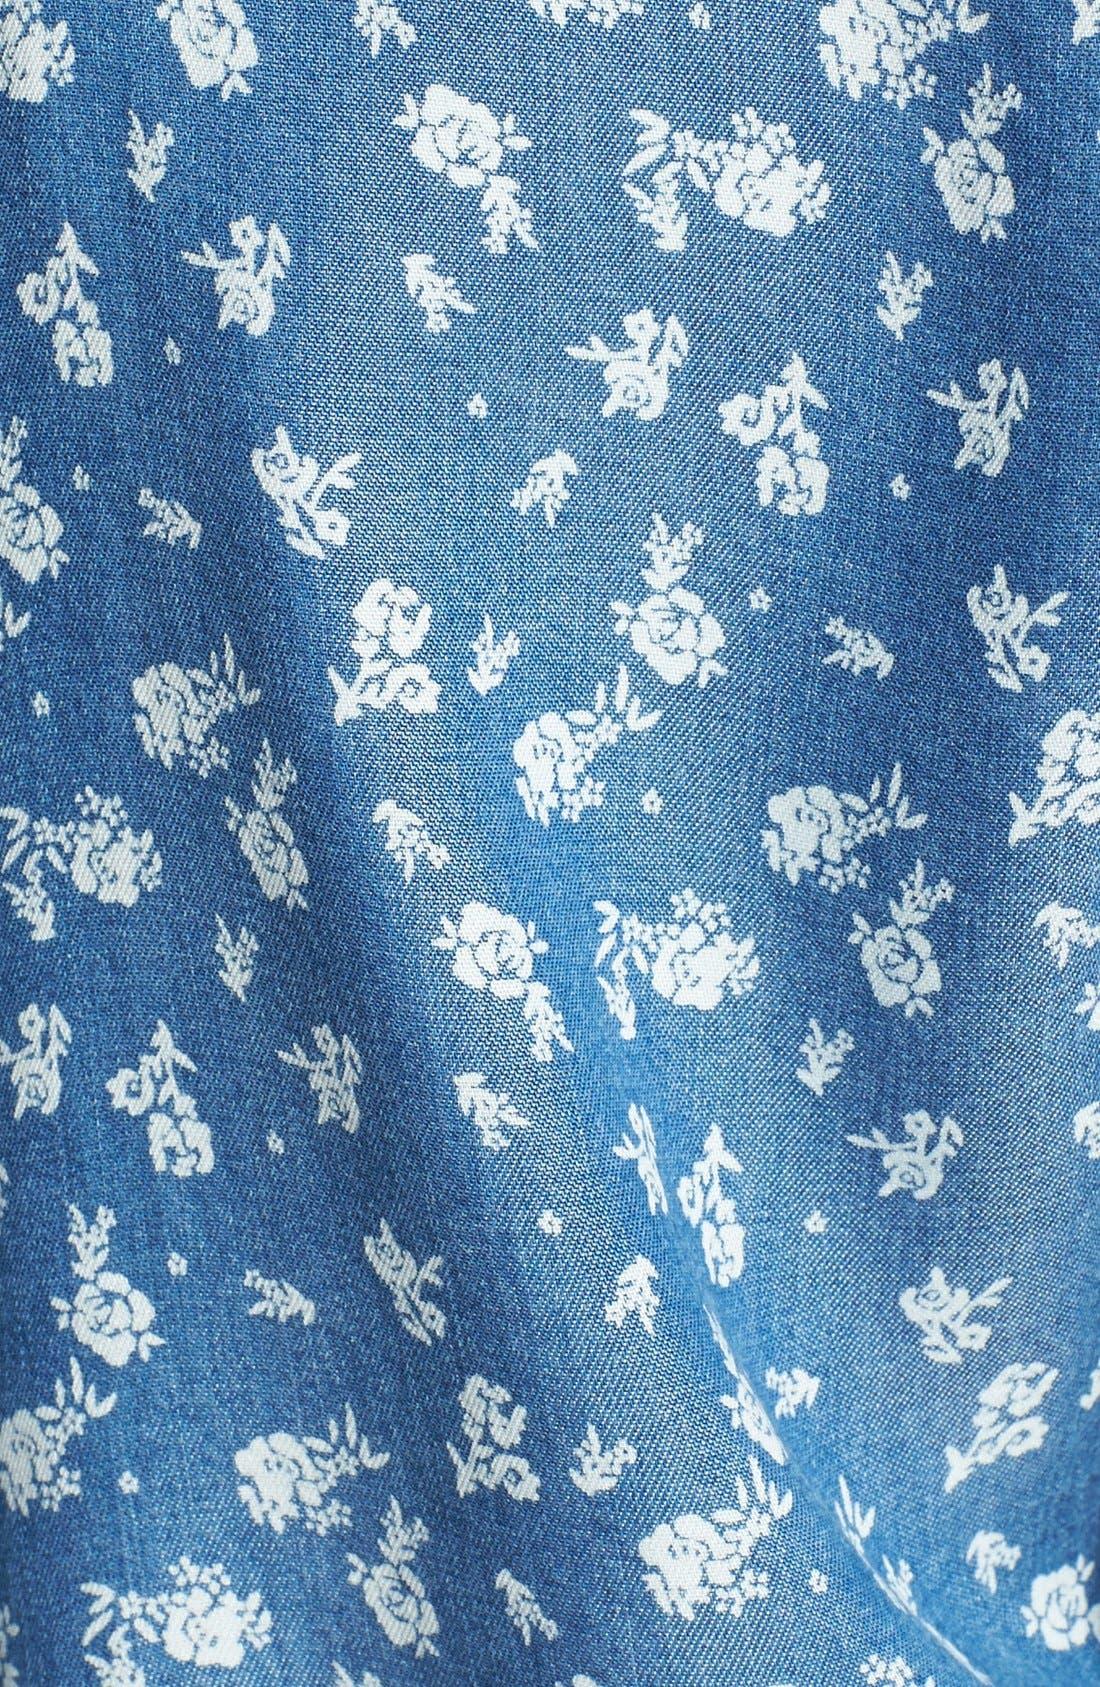 Floral Print Chambray Shirtdress,                             Alternate thumbnail 2, color,                             439